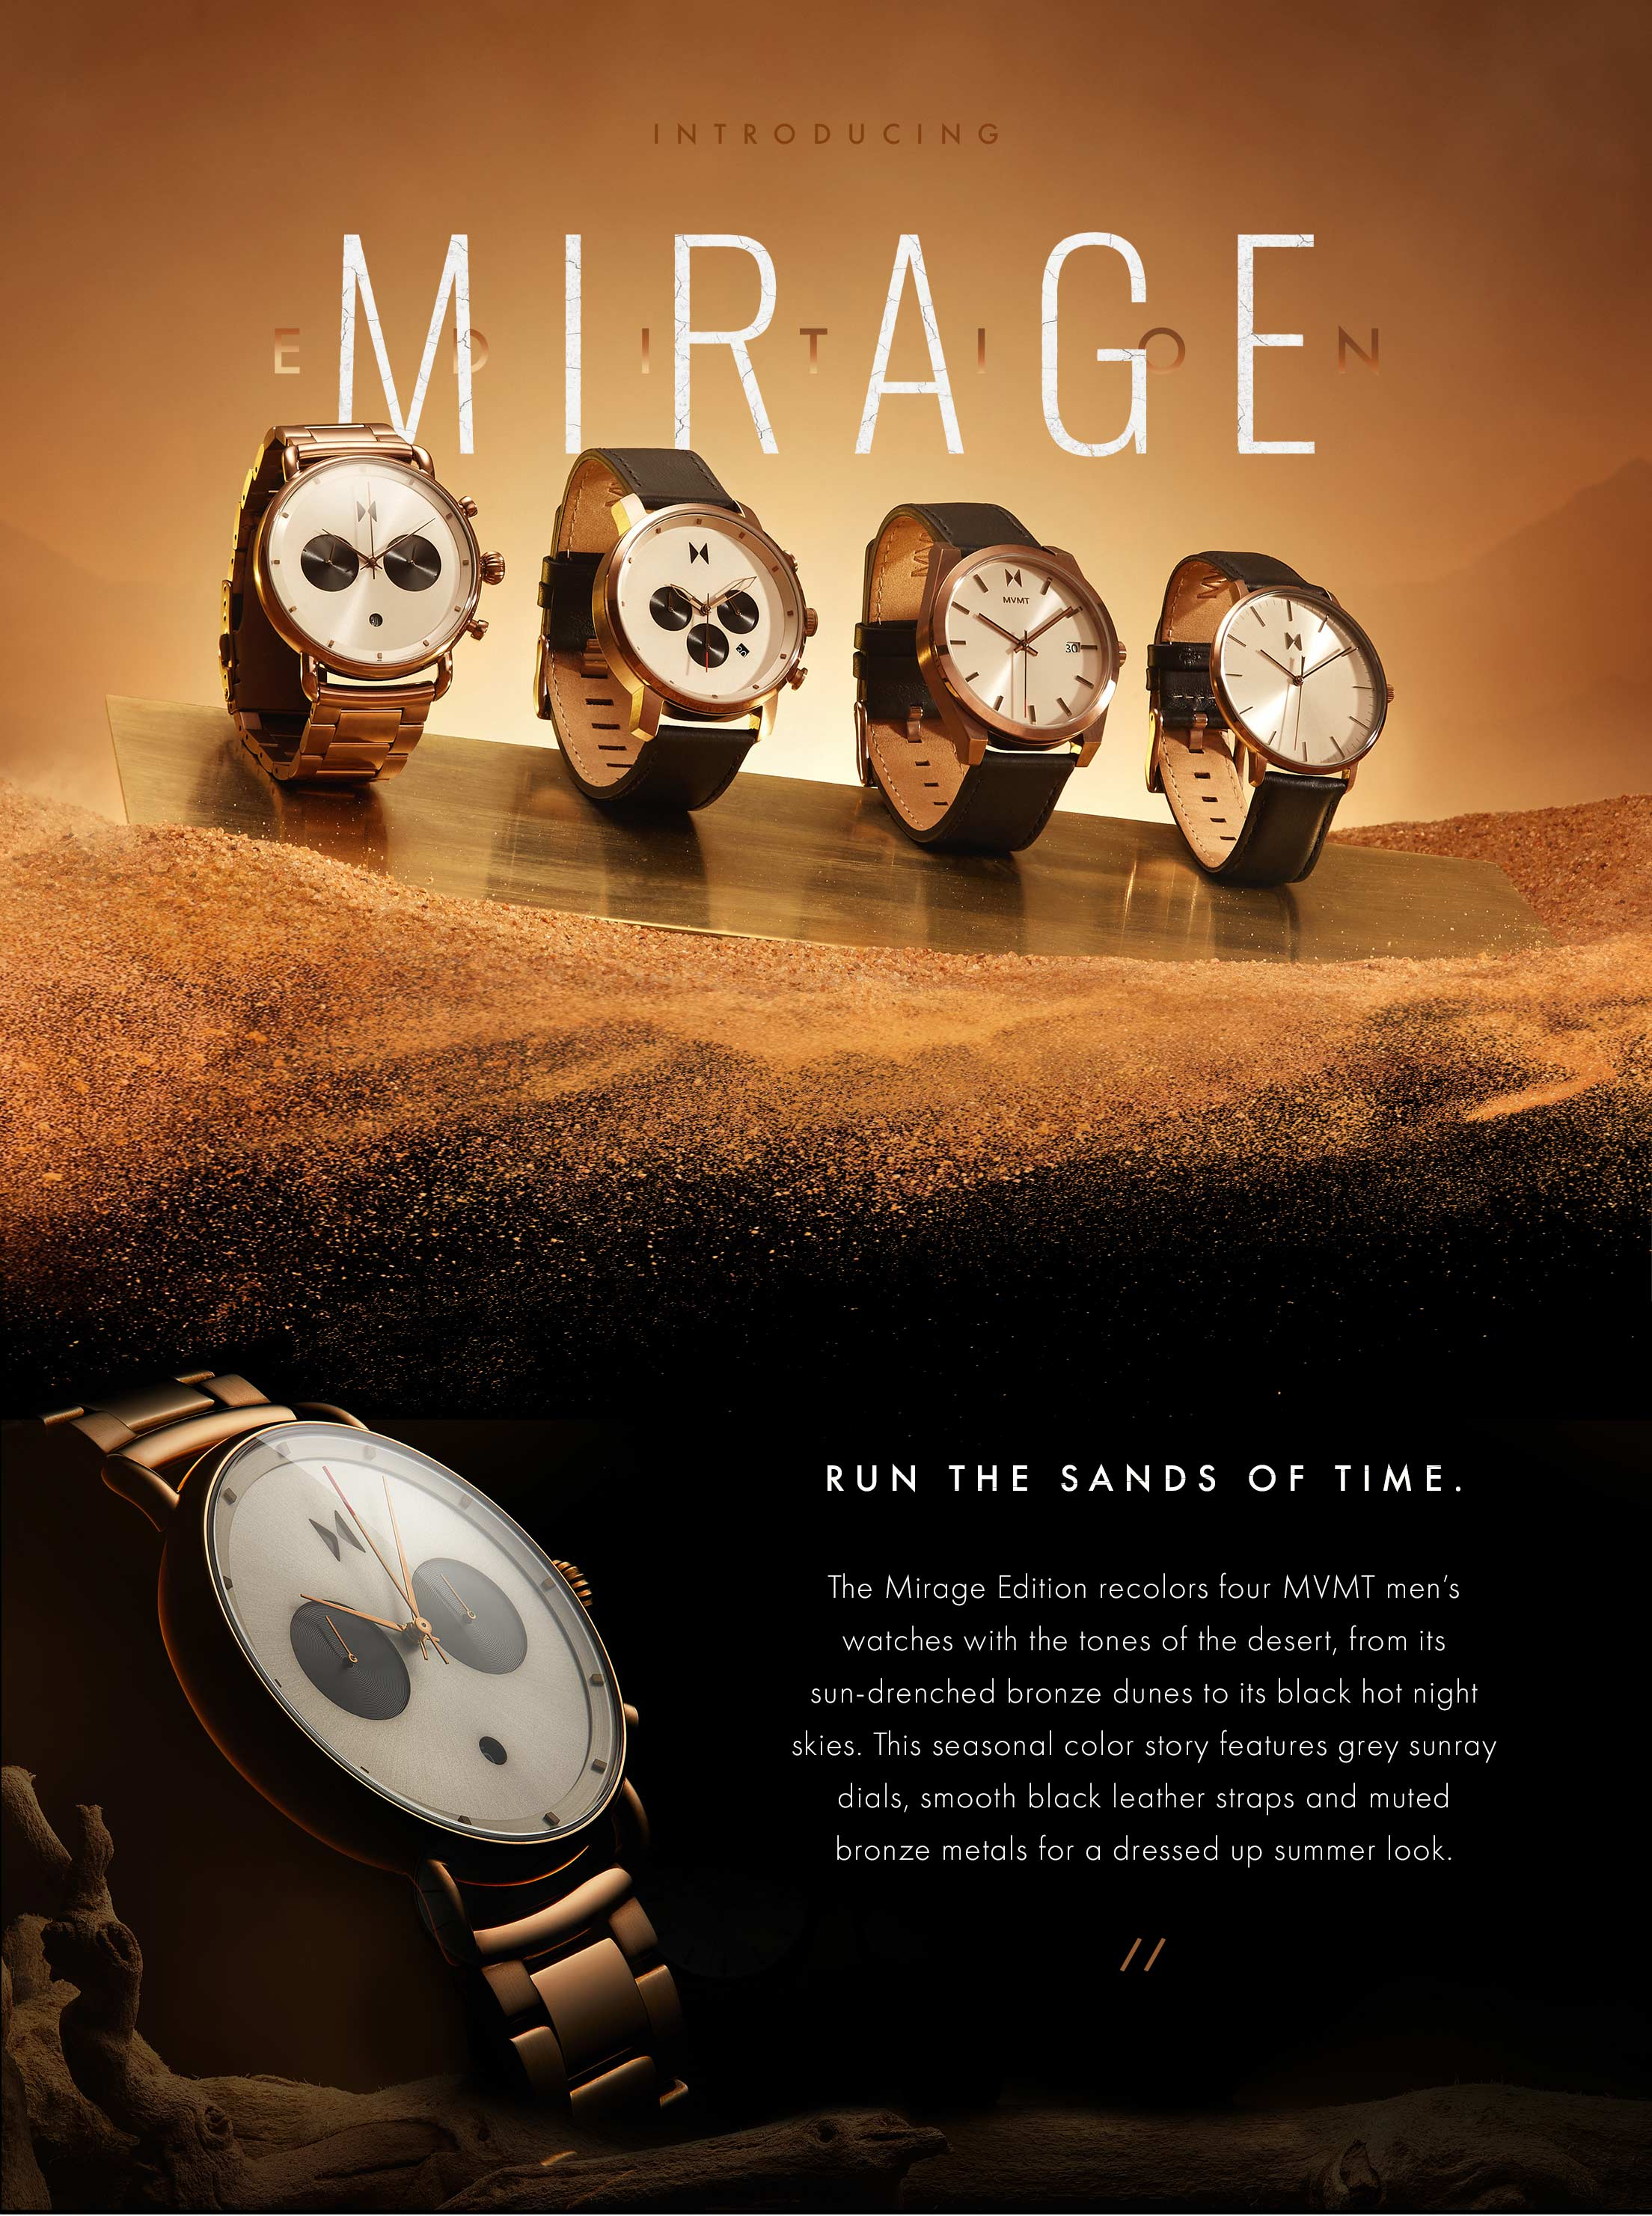 Mirage Edition